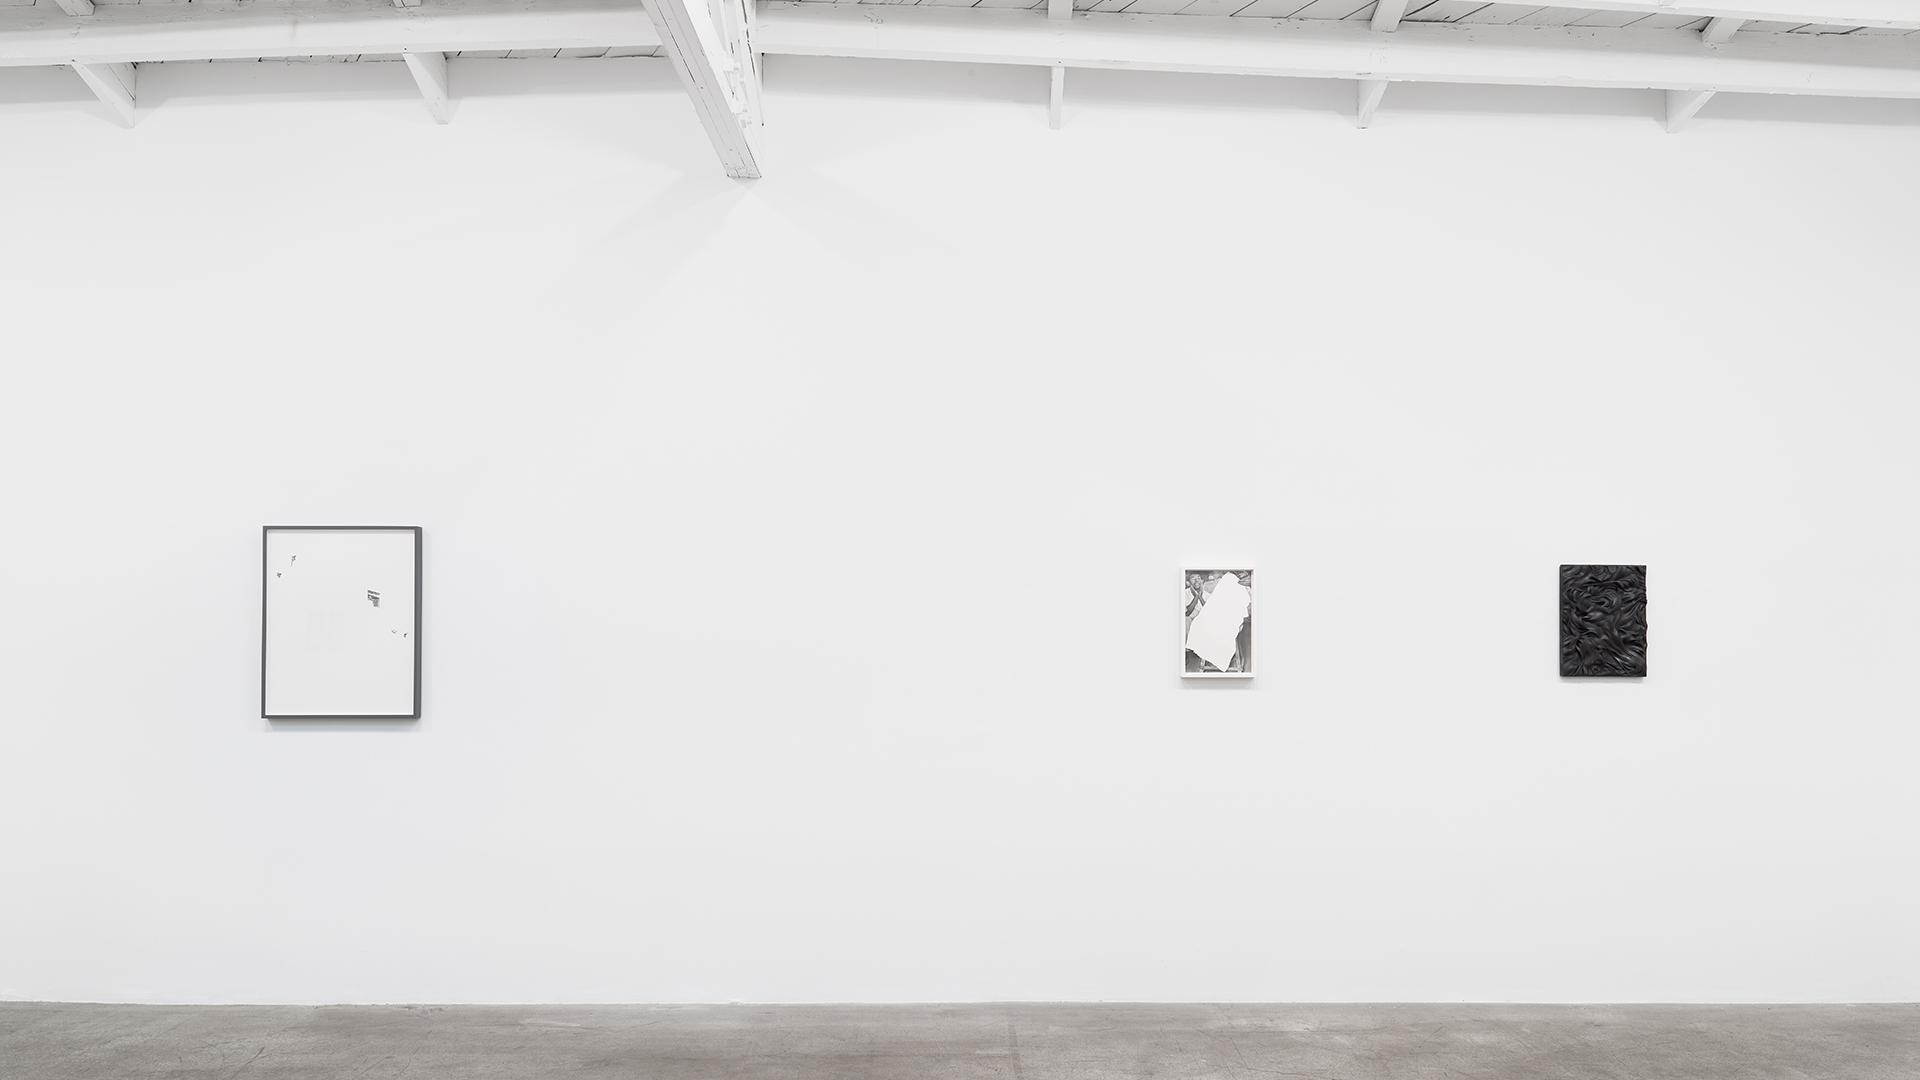 Exhibition view  Opportunity Cost  (solo), 2019, Praz-Delavallade, Los Angeles